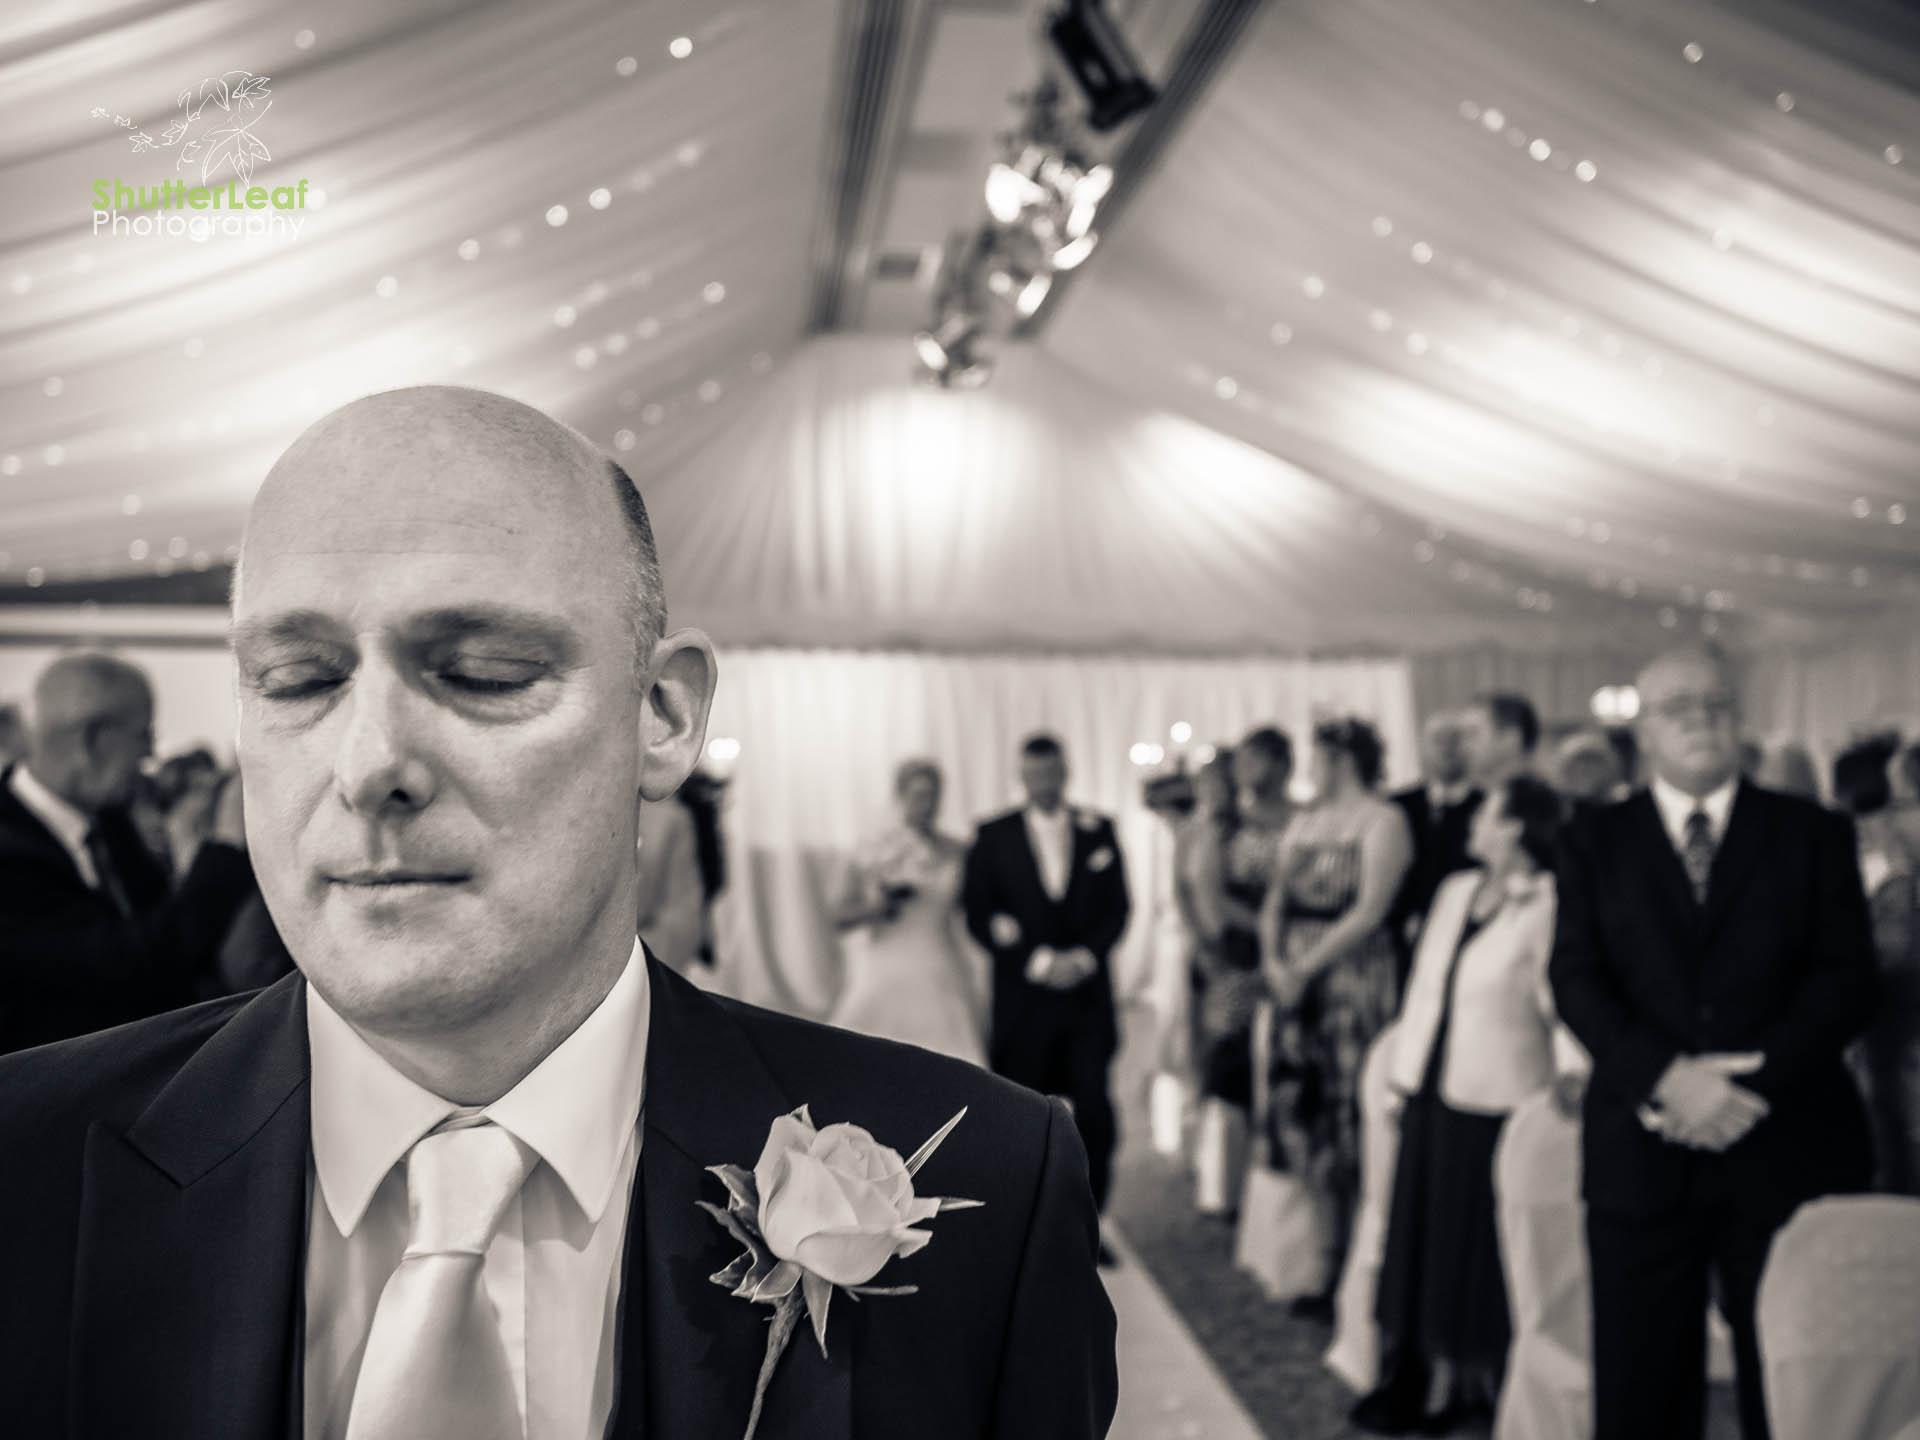 Lancashire Wedding Photographer - EM5 - distance to subject - Blog - shutterleaf.co.uk 0003